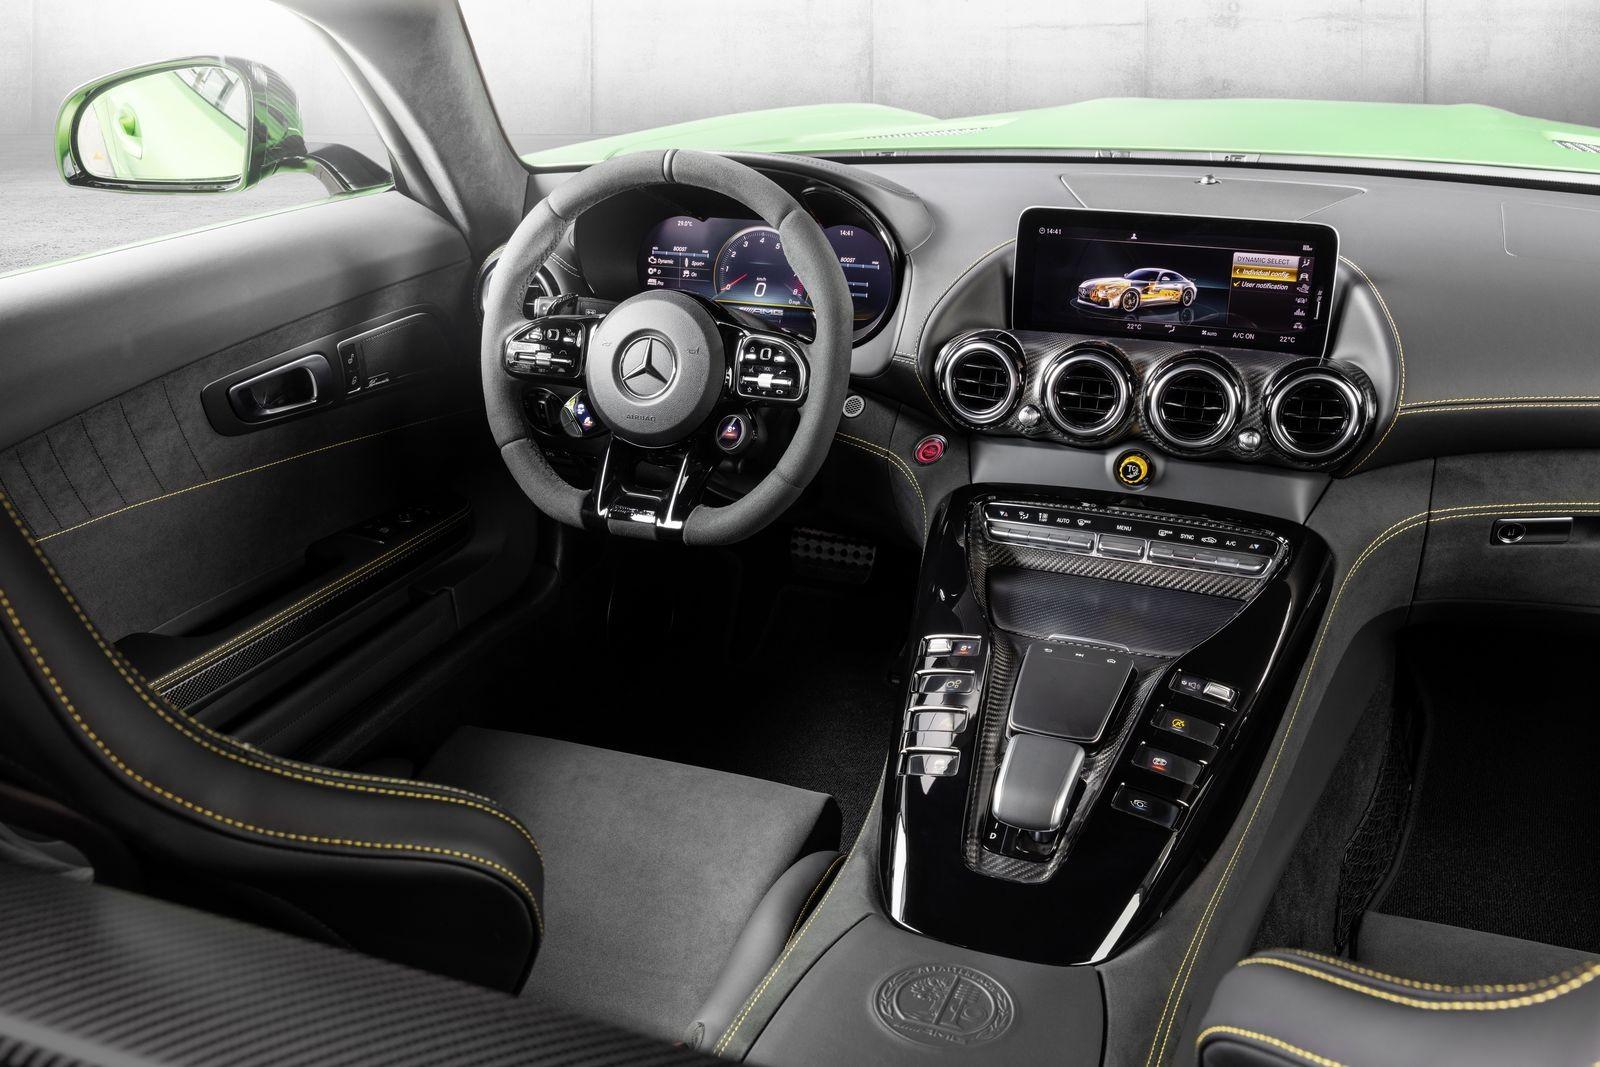 Der neue Mercedes-AMG GT und AMG GT R PRO: Nachgeschärft und noch agiler The new Mercedes-AMG GT and AMG GT R PRO: Further honed and even more agile